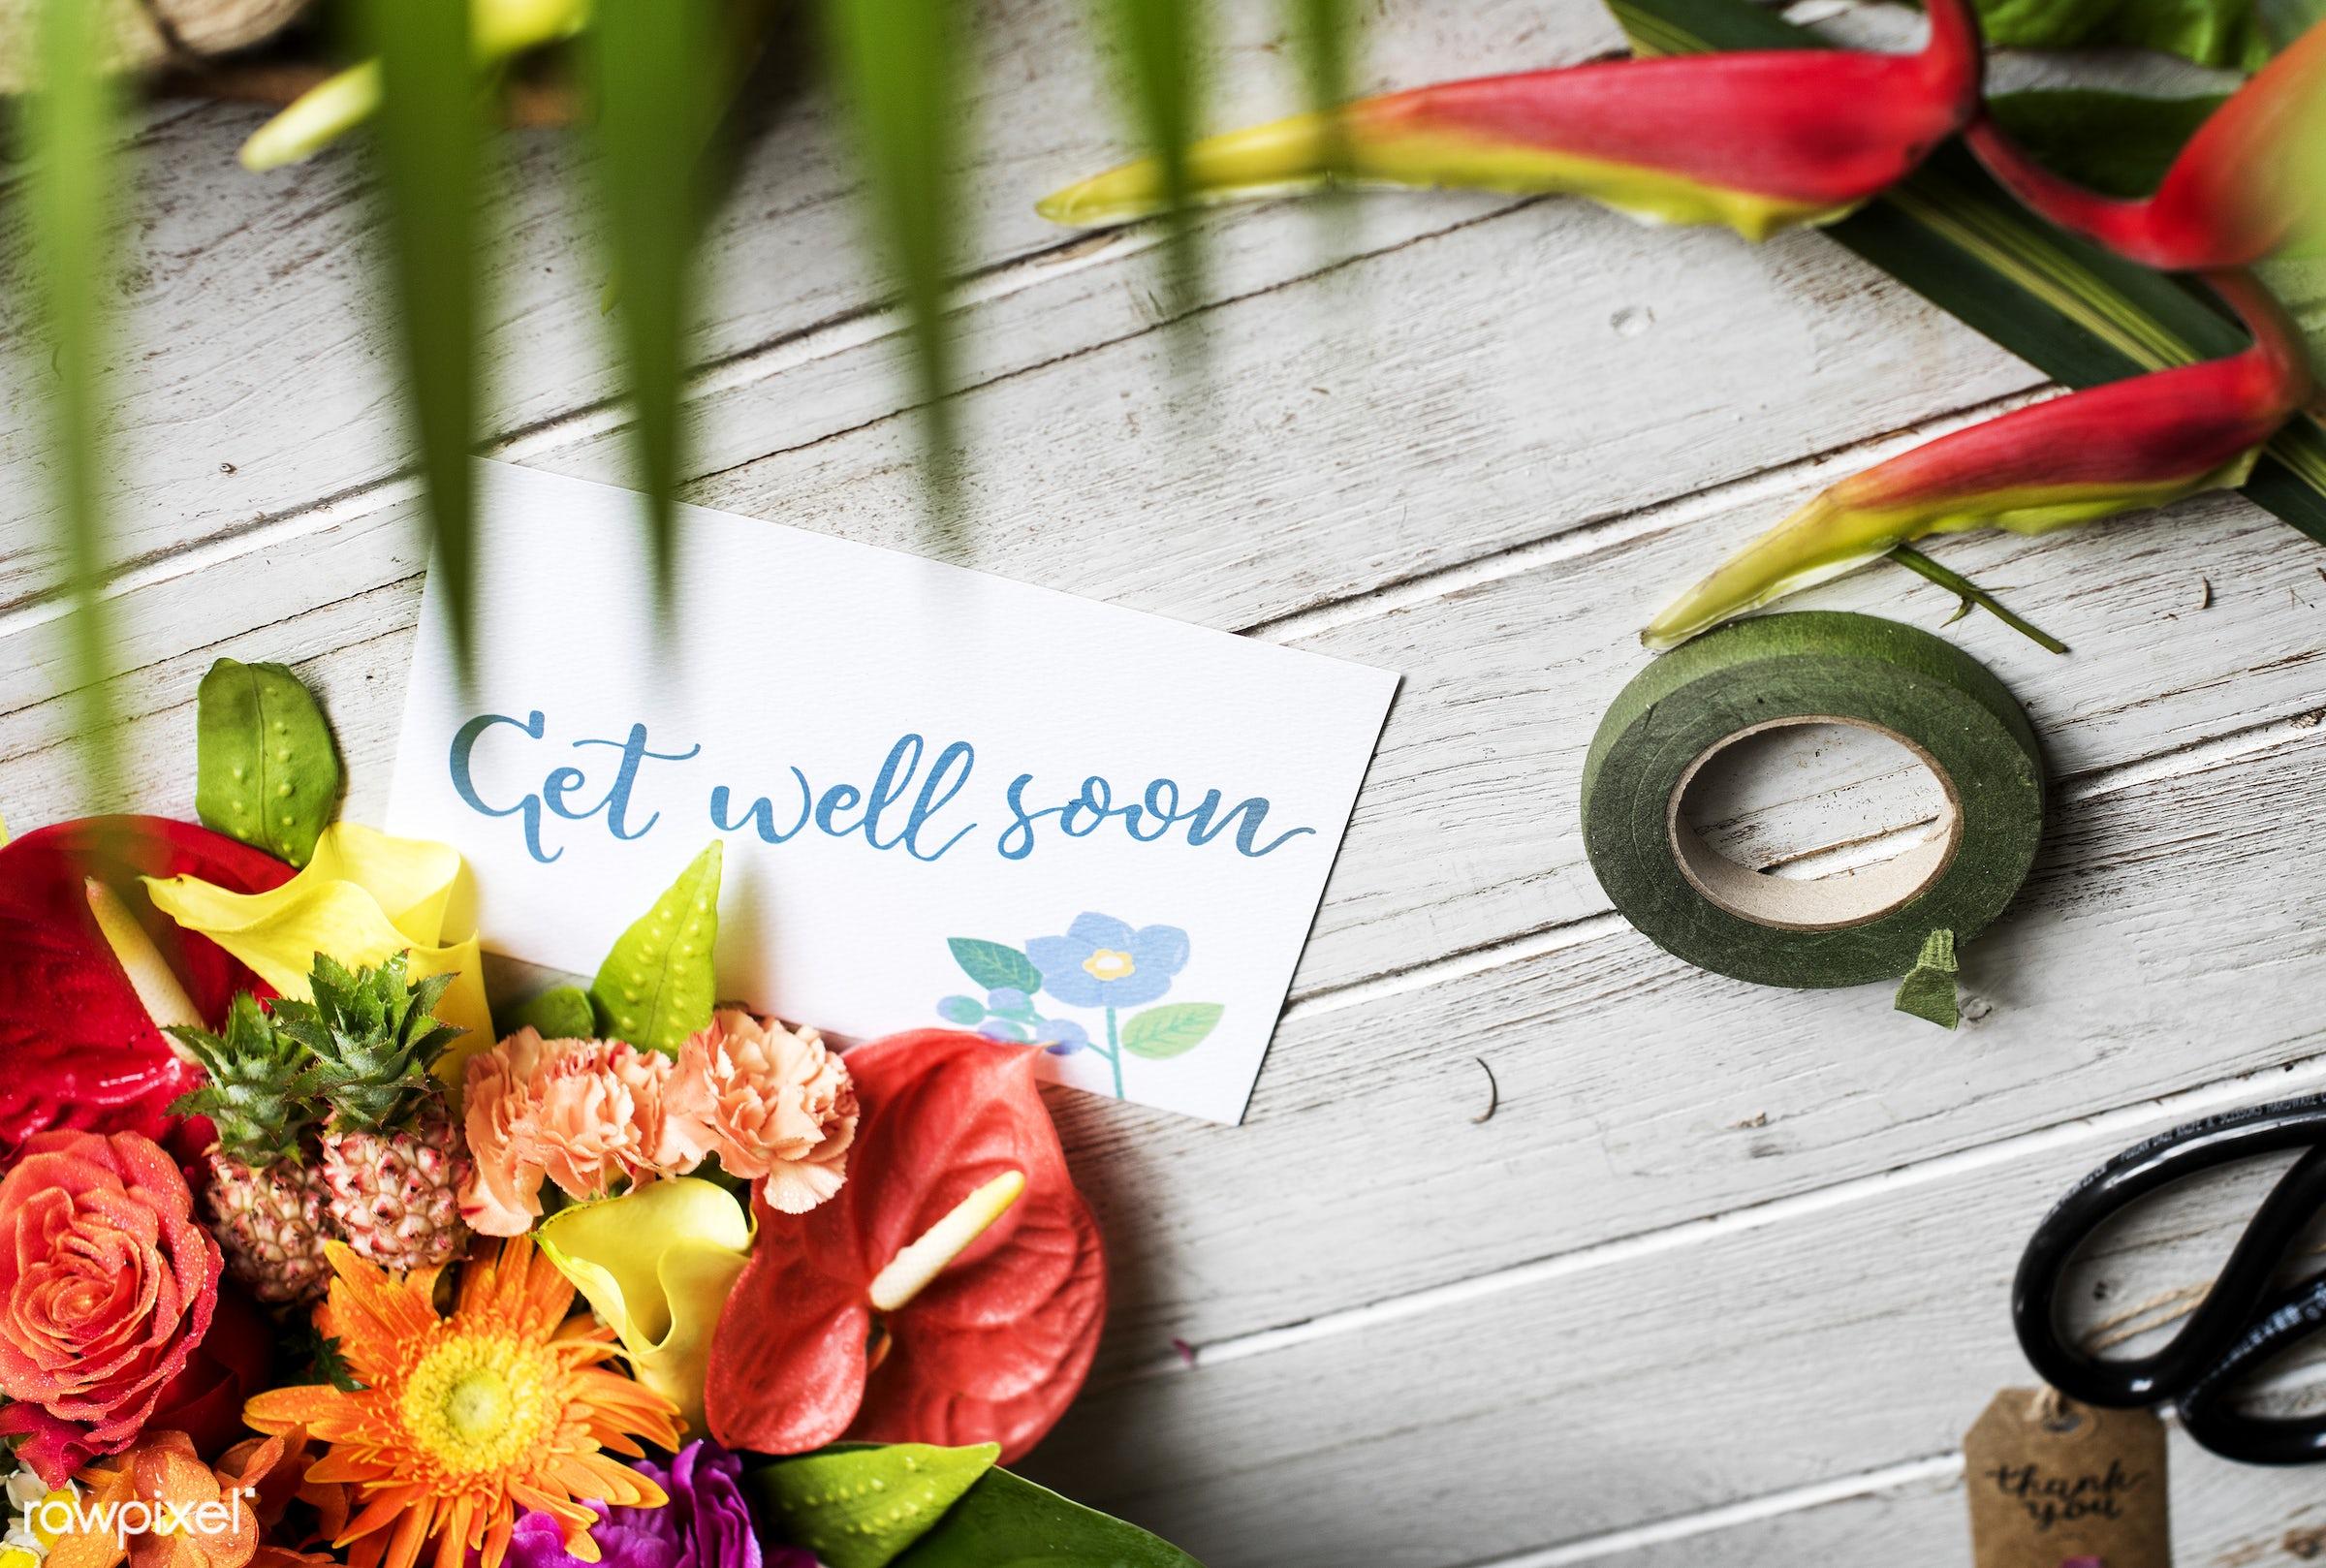 plant, bouquet, decoration, flora, refreshment, leisure, table, florist, wooden, recreational, fresh, card, get well soon,...